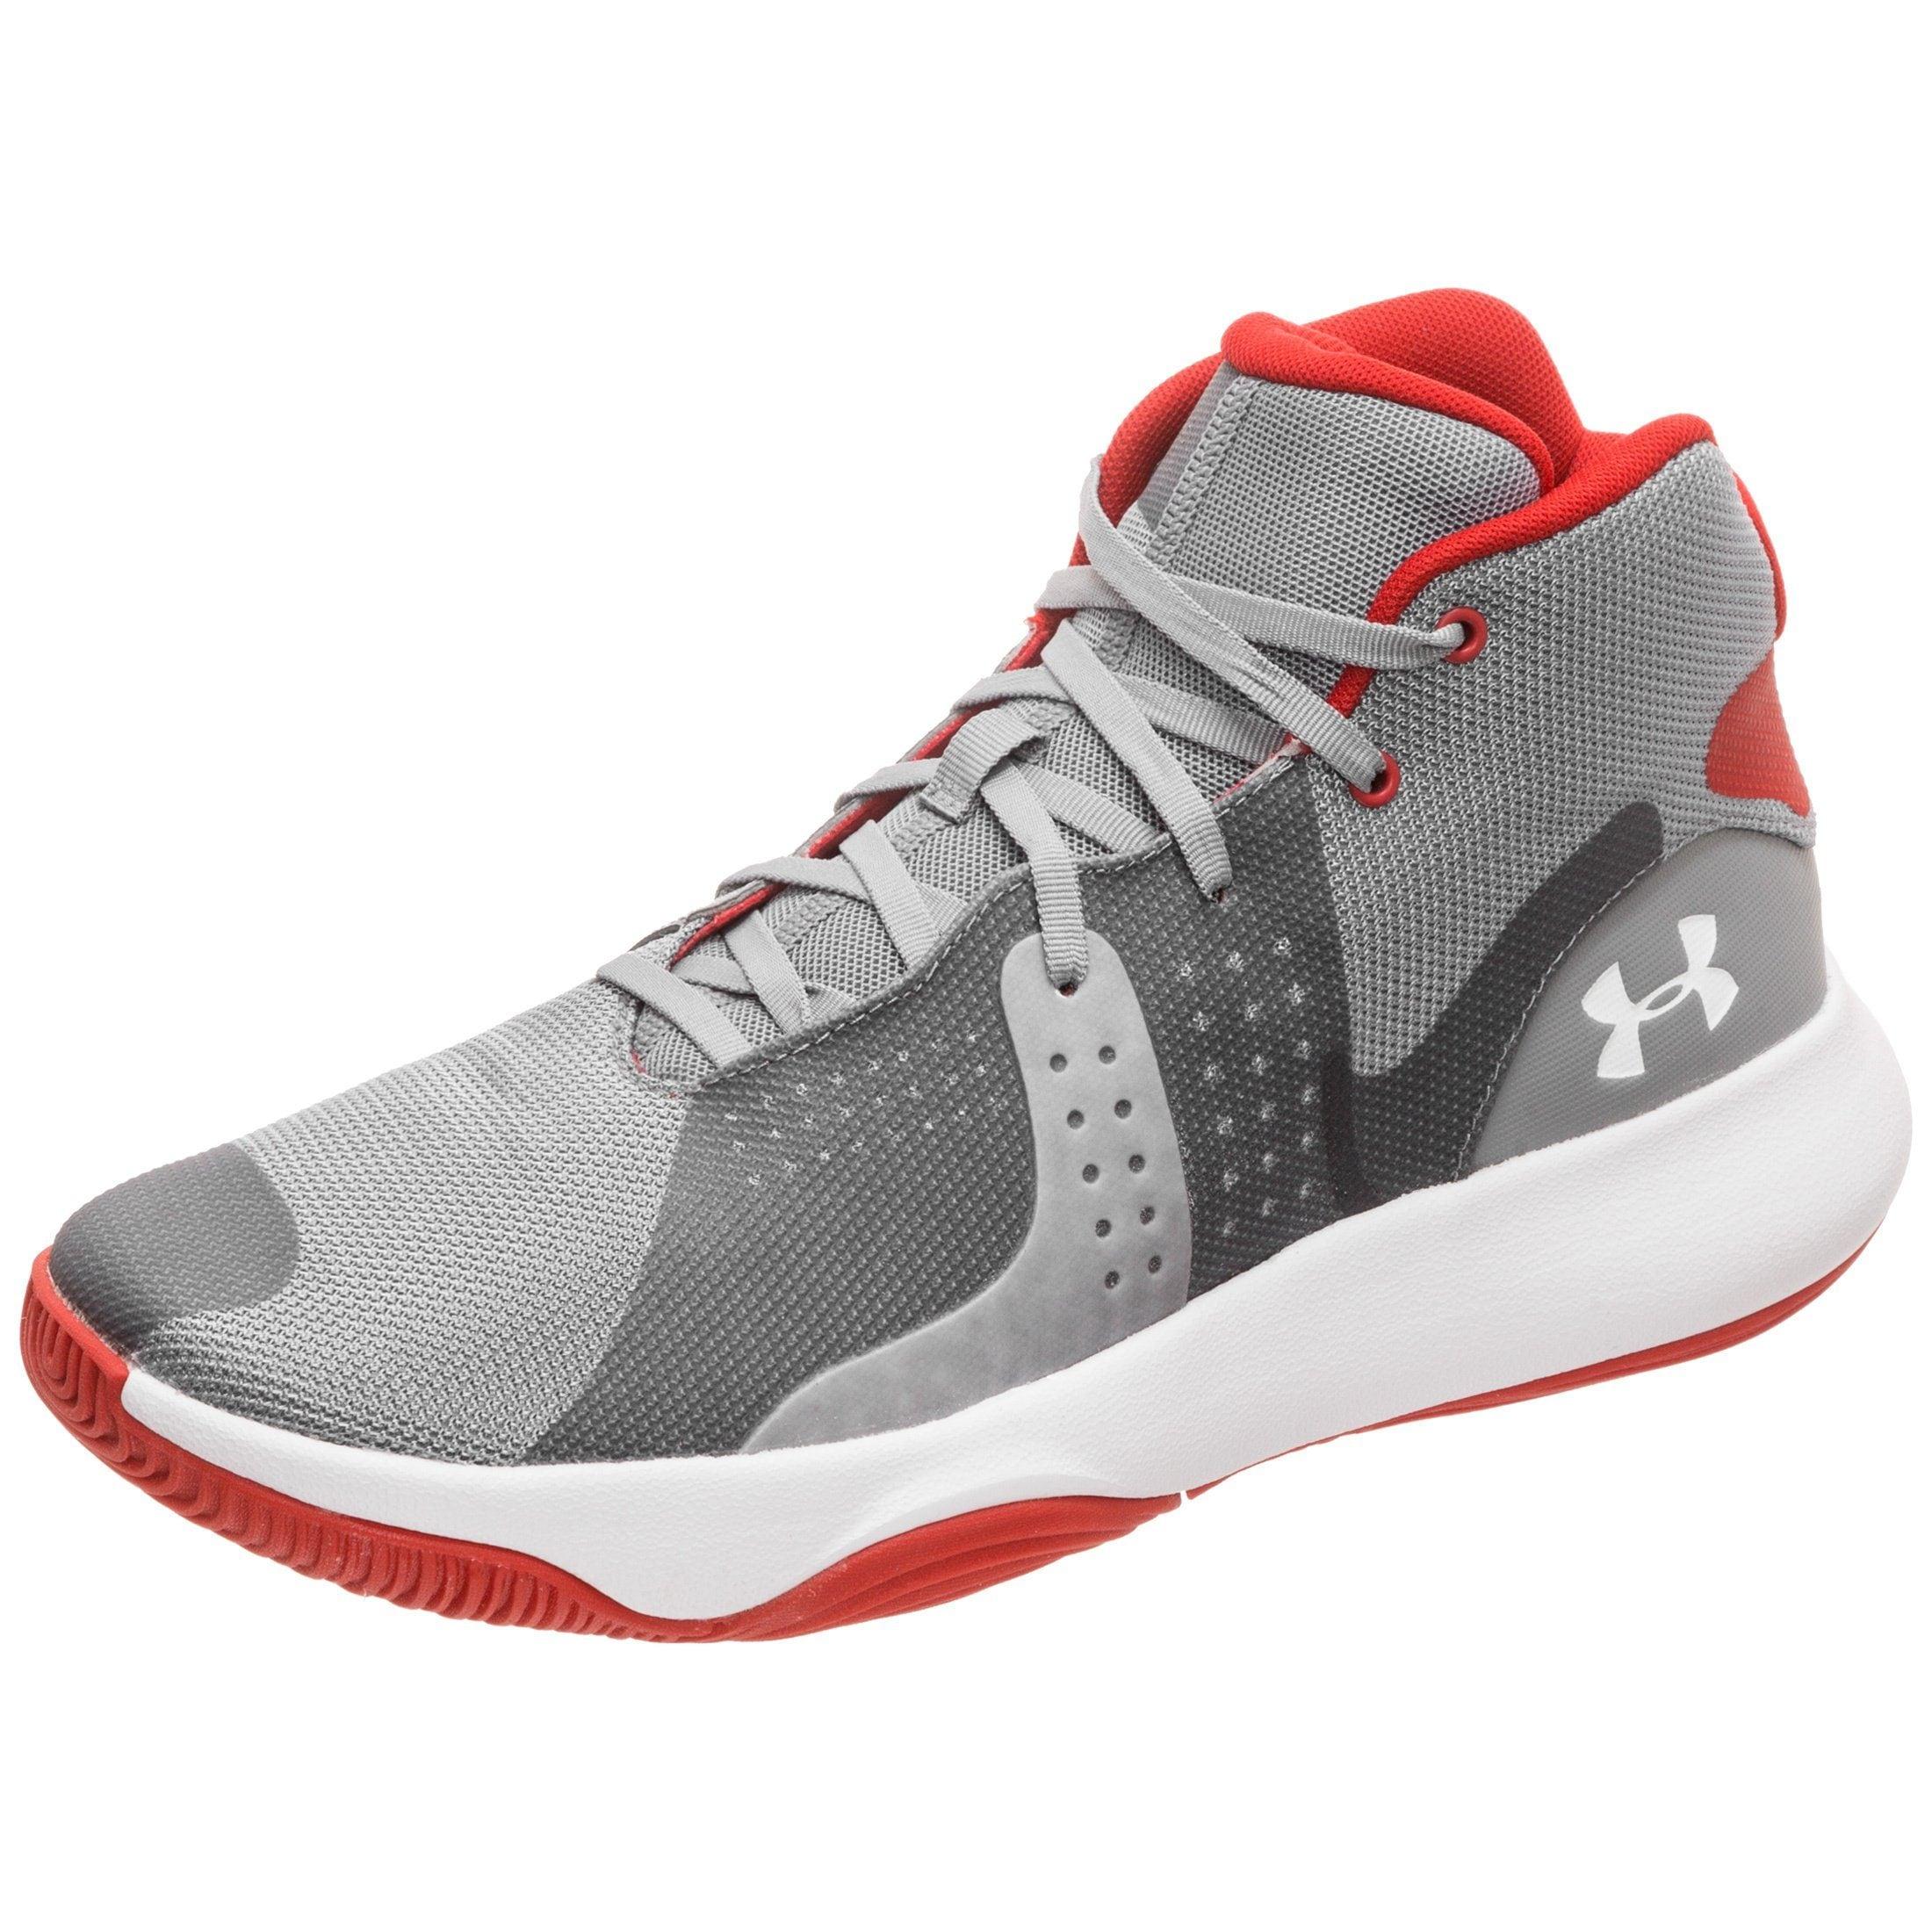 Under Armour Basketballschuh Anomaly | Schuhe > Sportschuhe > Basketballschuhe | Under Armour